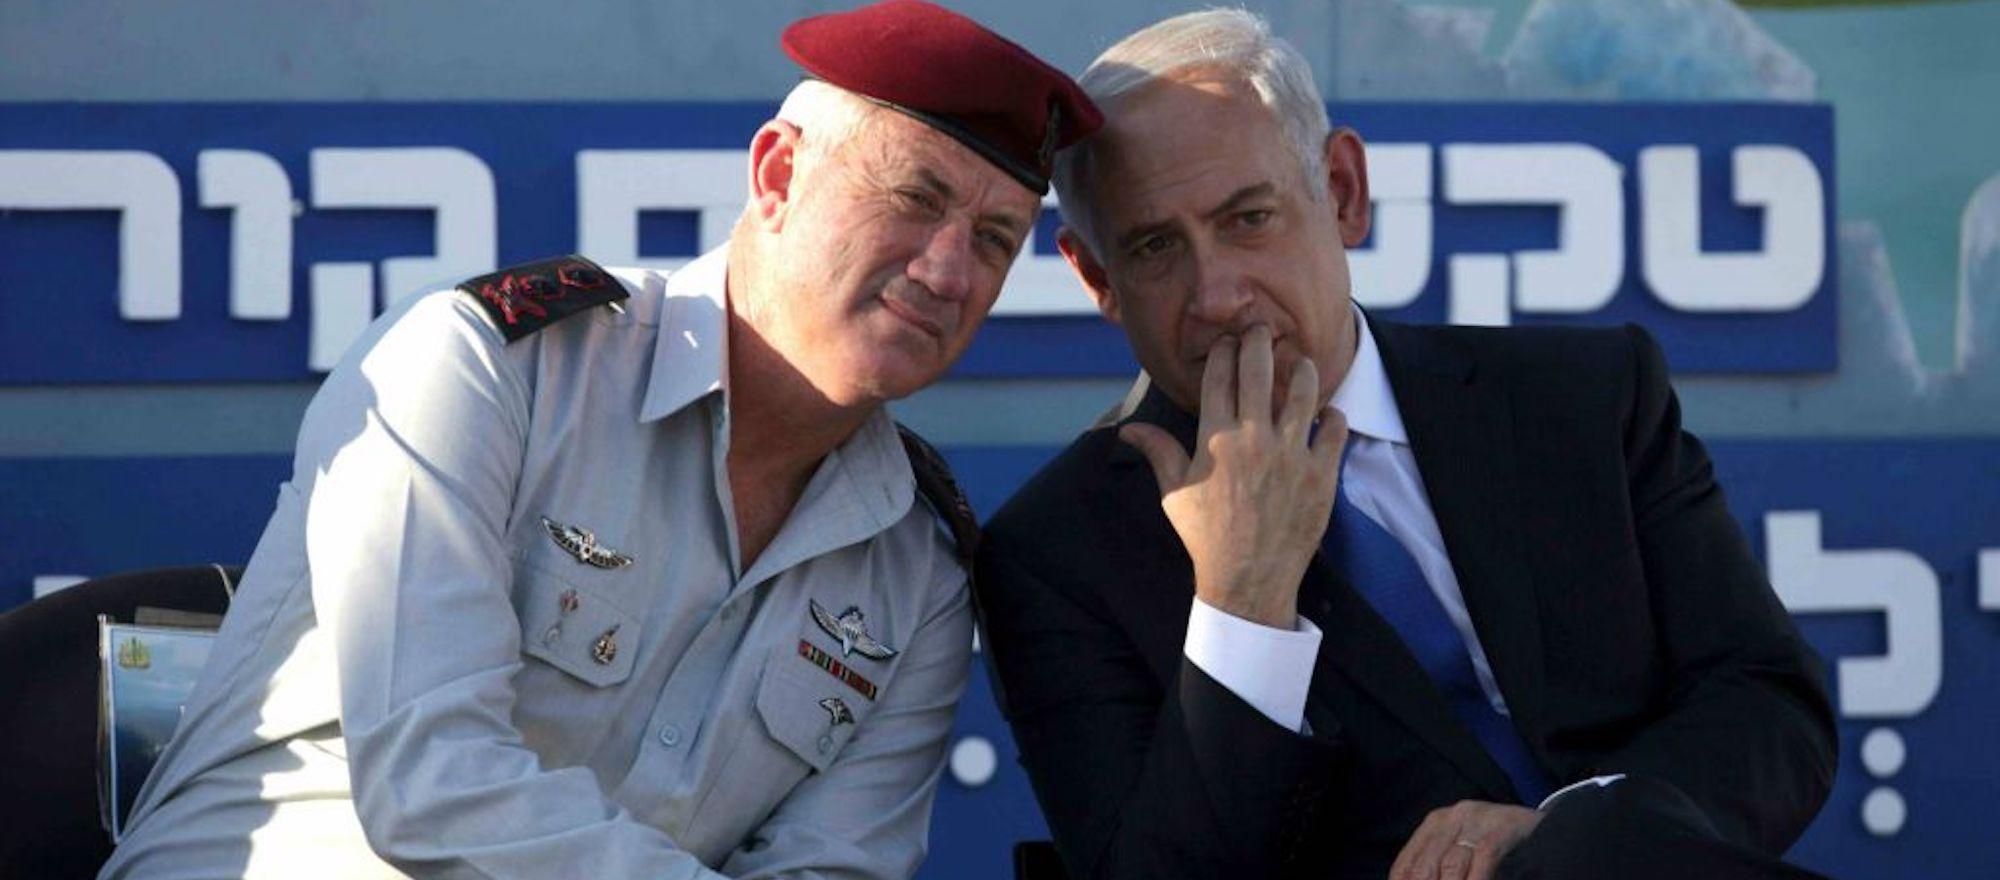 Israeli party leader Gantz says Netanyahu threatening 'civil war'